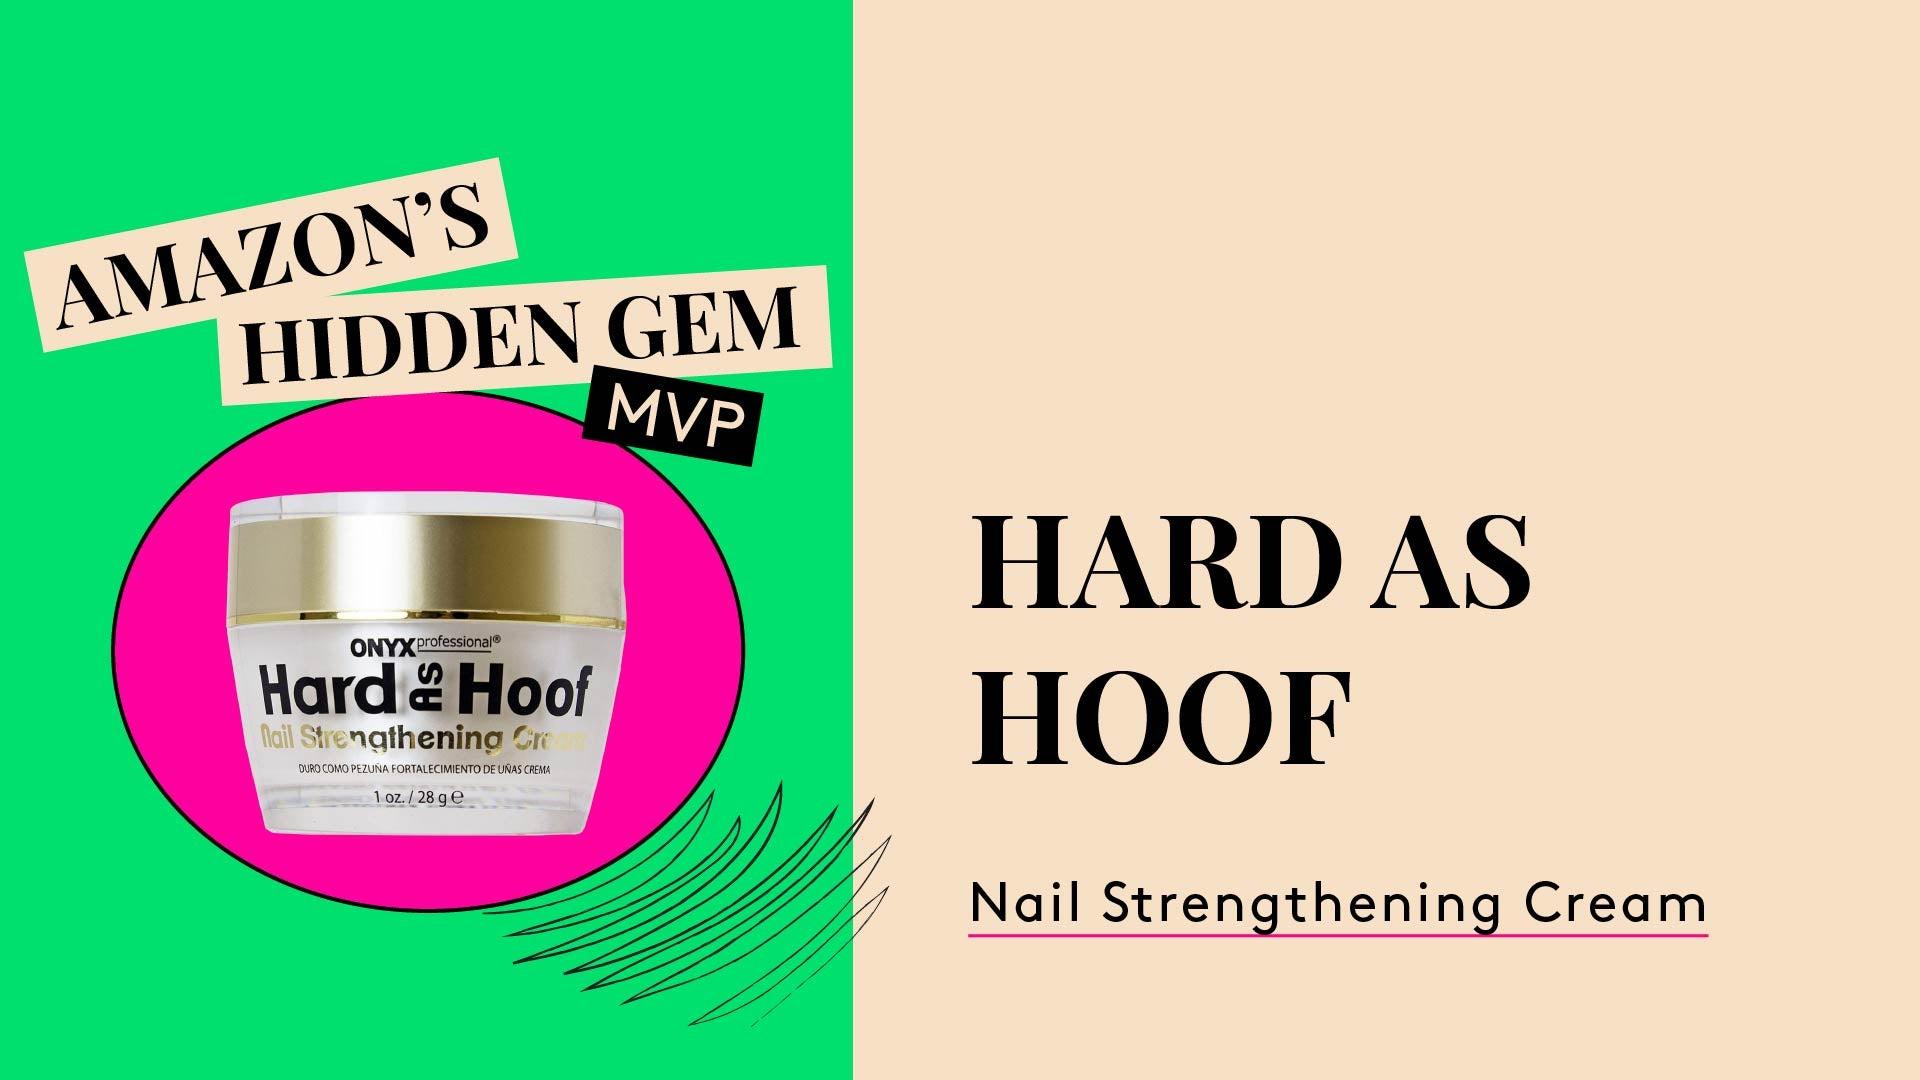 Manicure MVP. Onyx Hard as Hoof nail creme. An Amazon Hidden Gem.